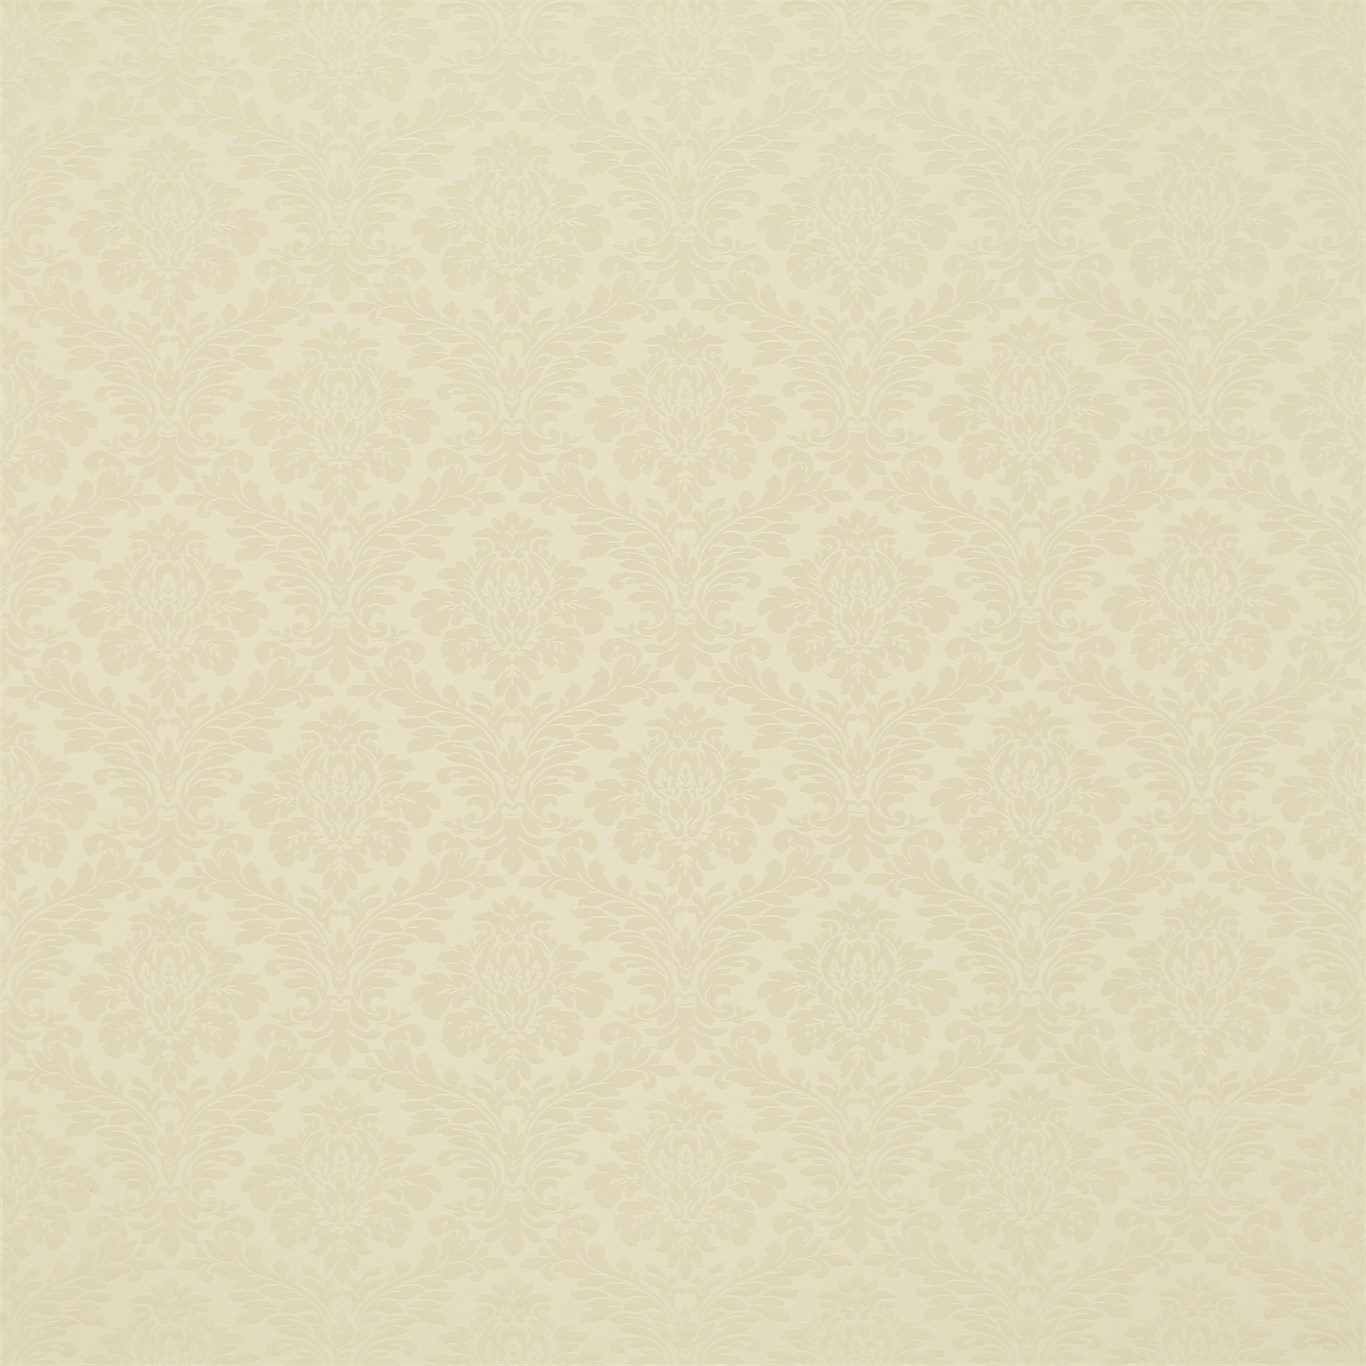 Image of Sanderson Lymington Damask White Clay Fabric 232626